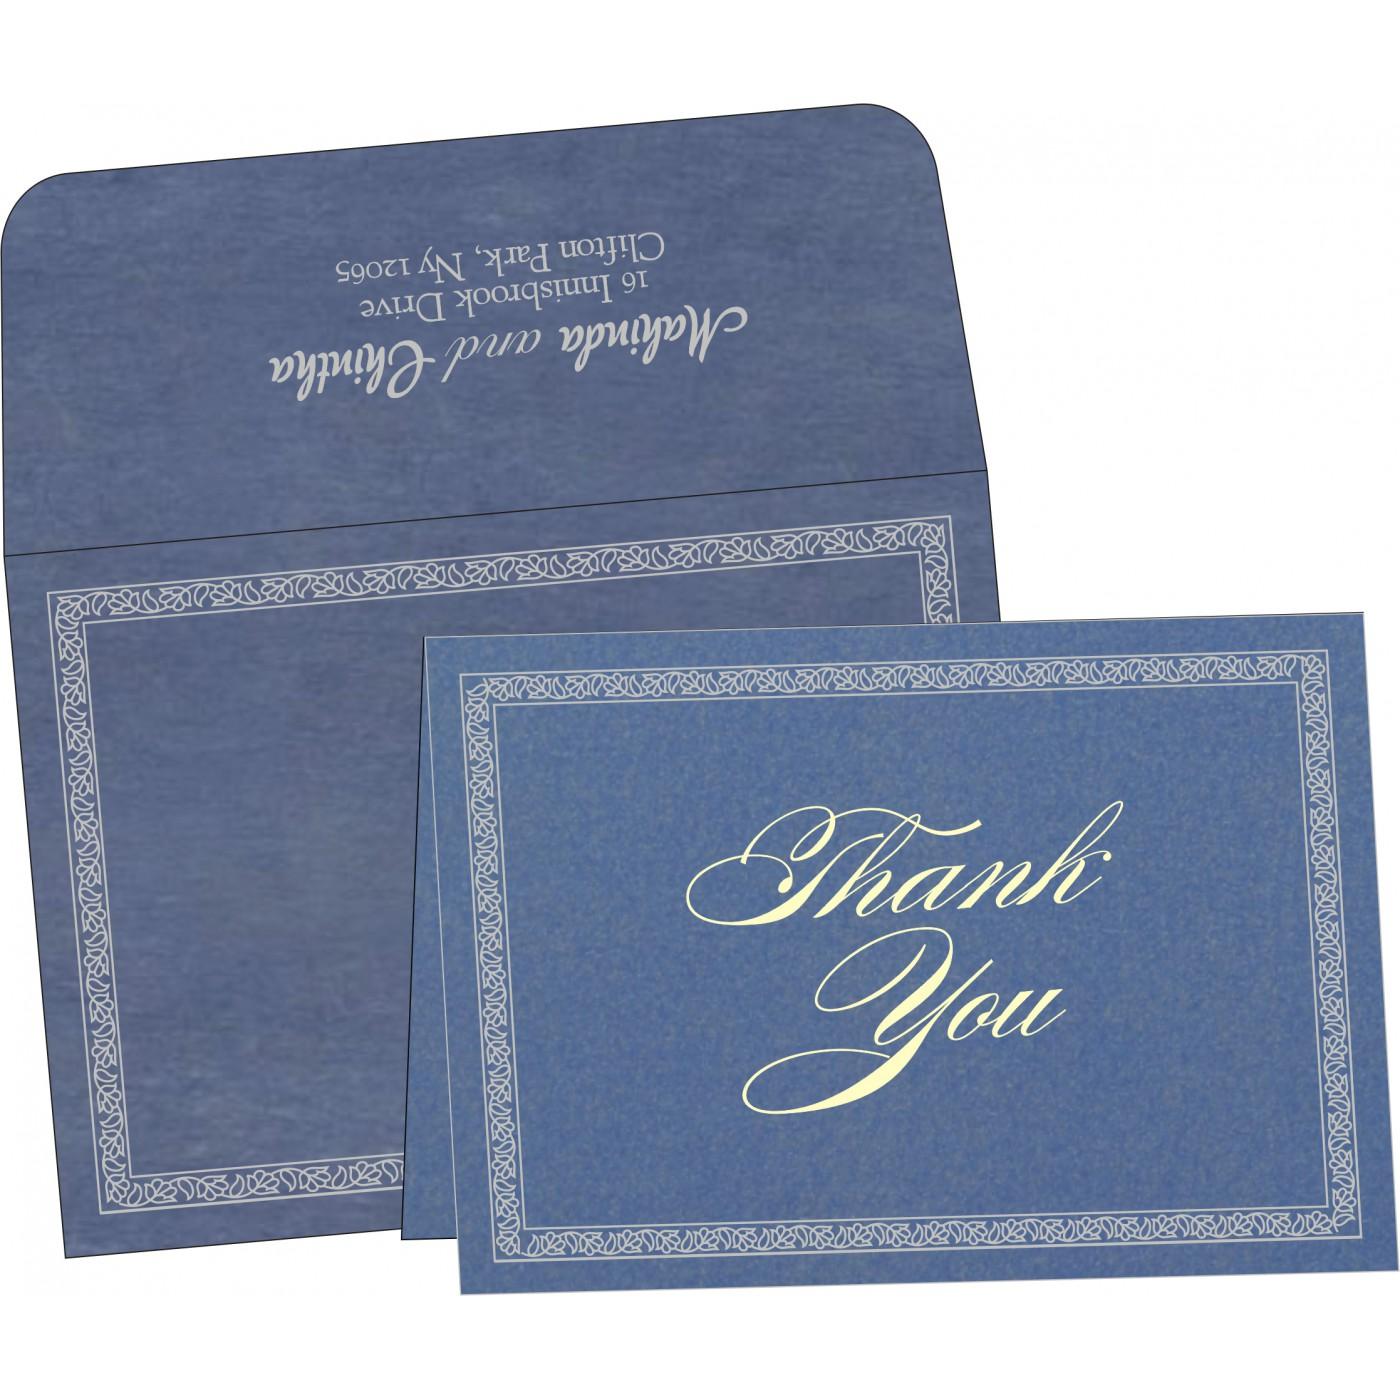 Thank You Cards : TYC-8211P - 123WeddingCards